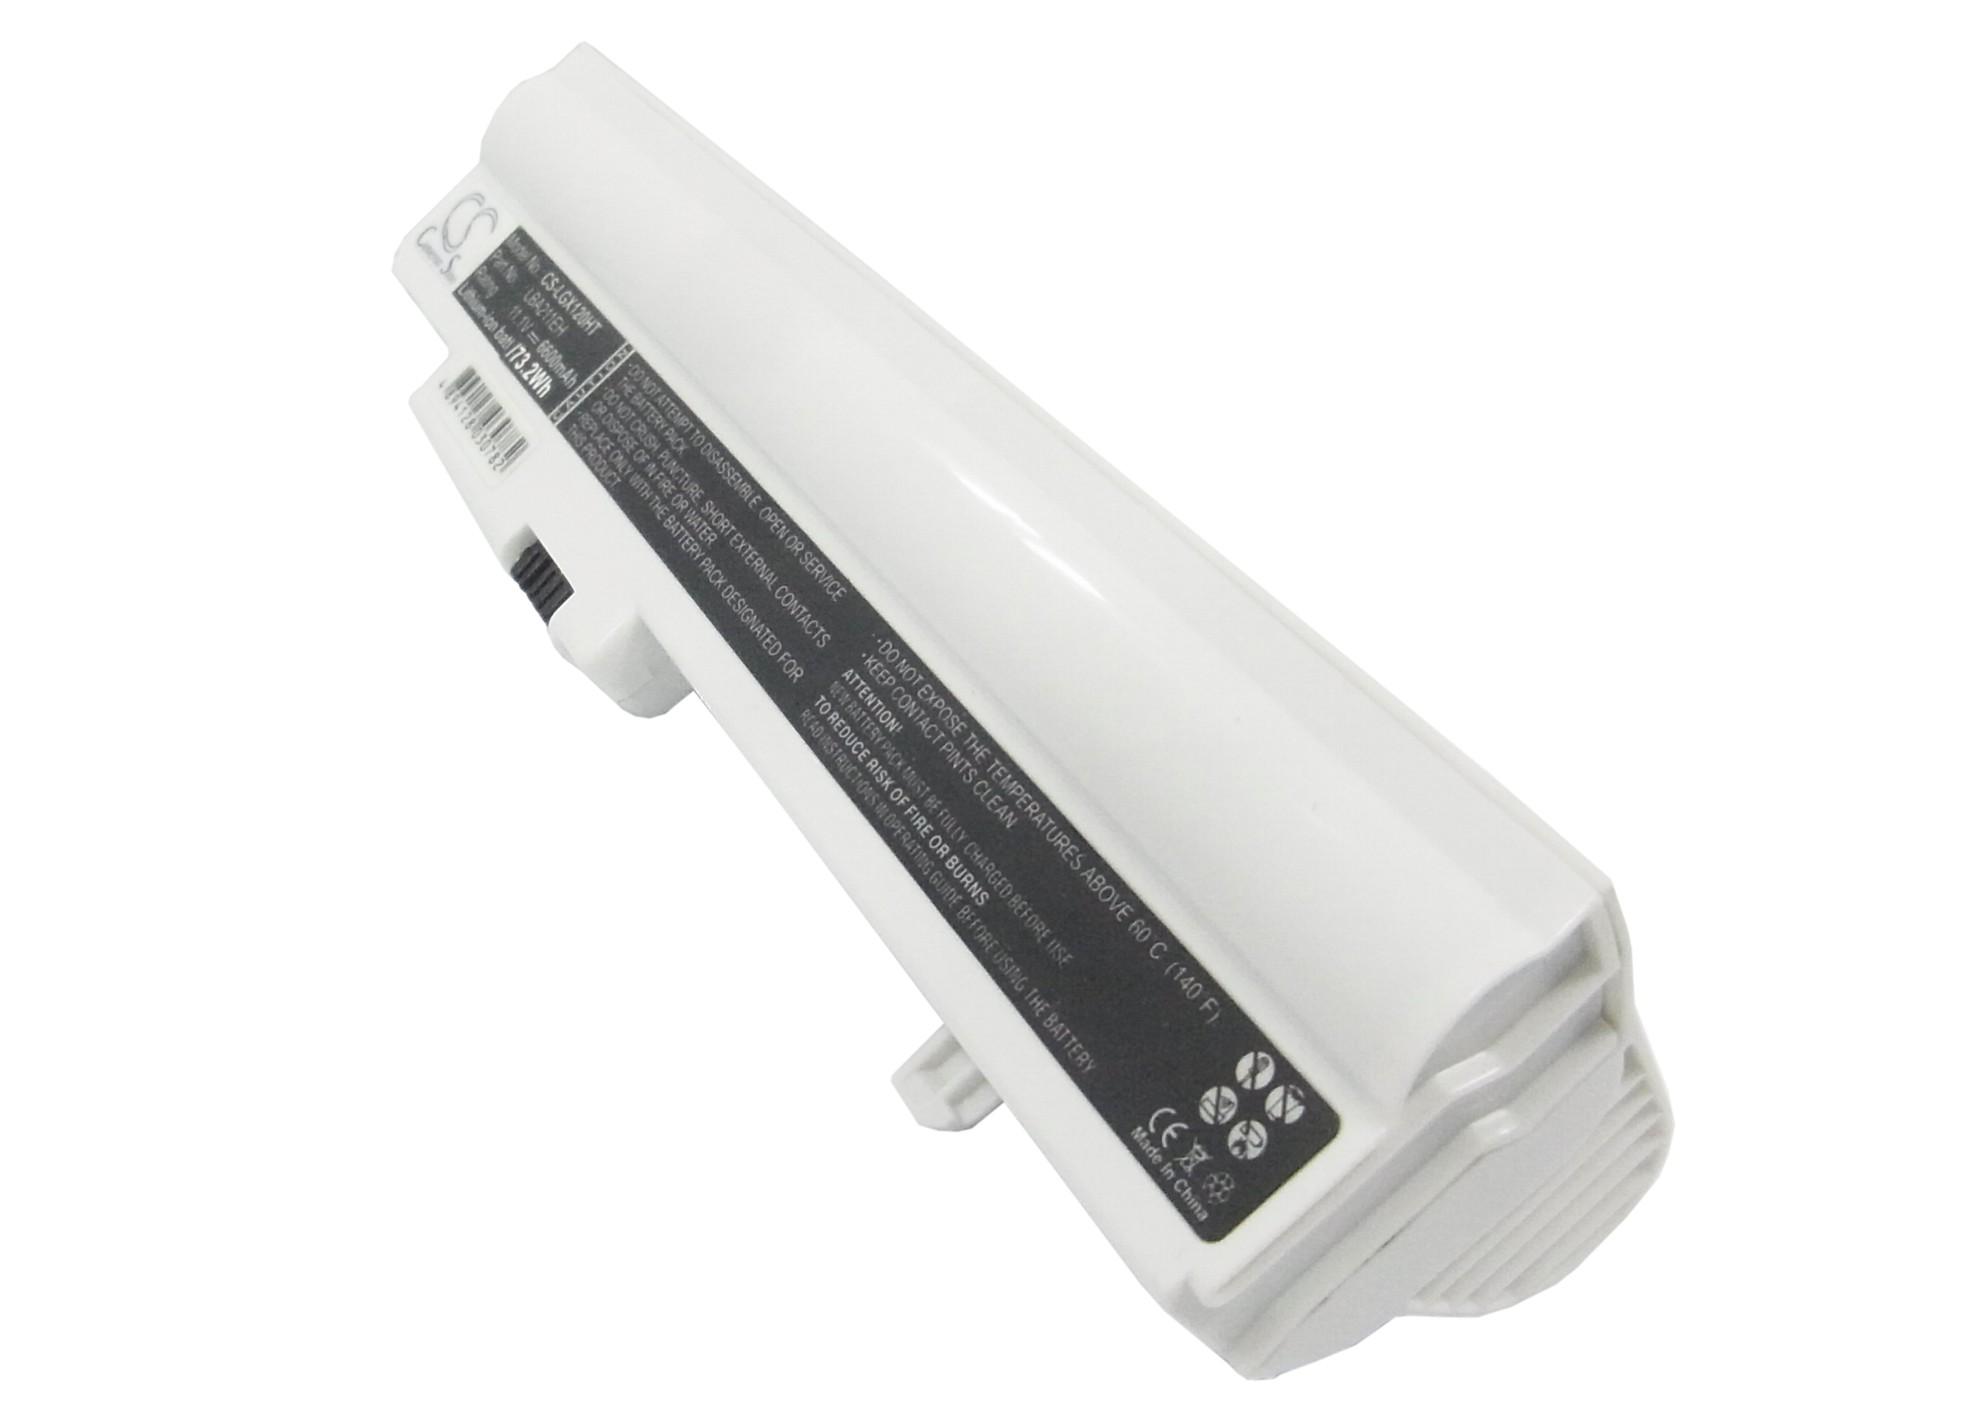 Cameron Sino baterie do netbooků pro LG X120-N 11.1V Li-ion 6600mAh bílá - neoriginální